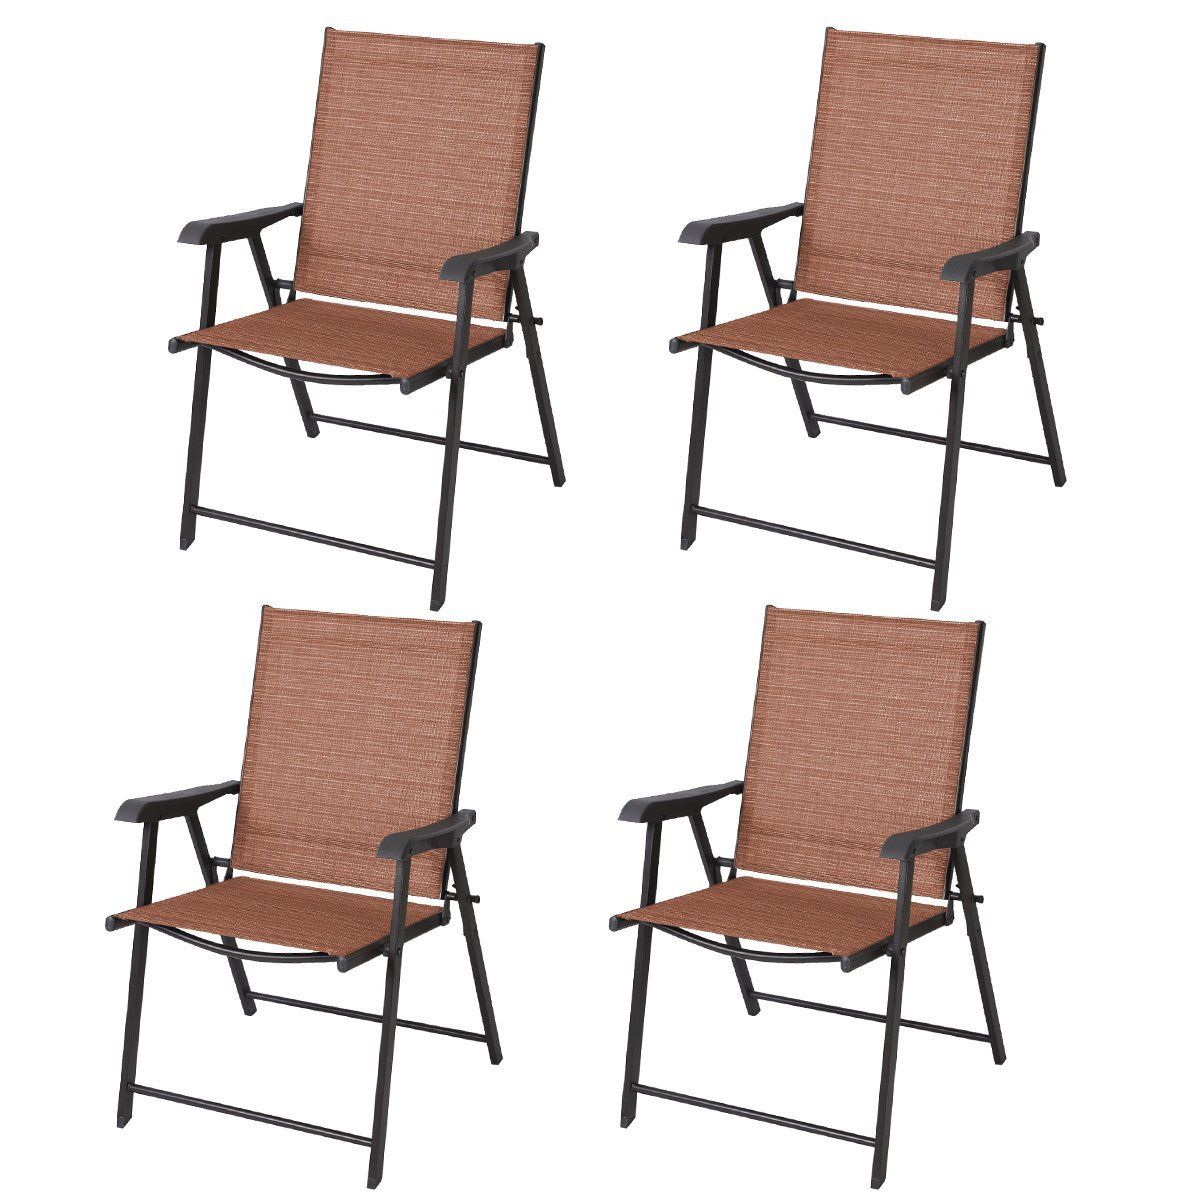 Giantex Outdoor Patio Folding Chairs Furniture